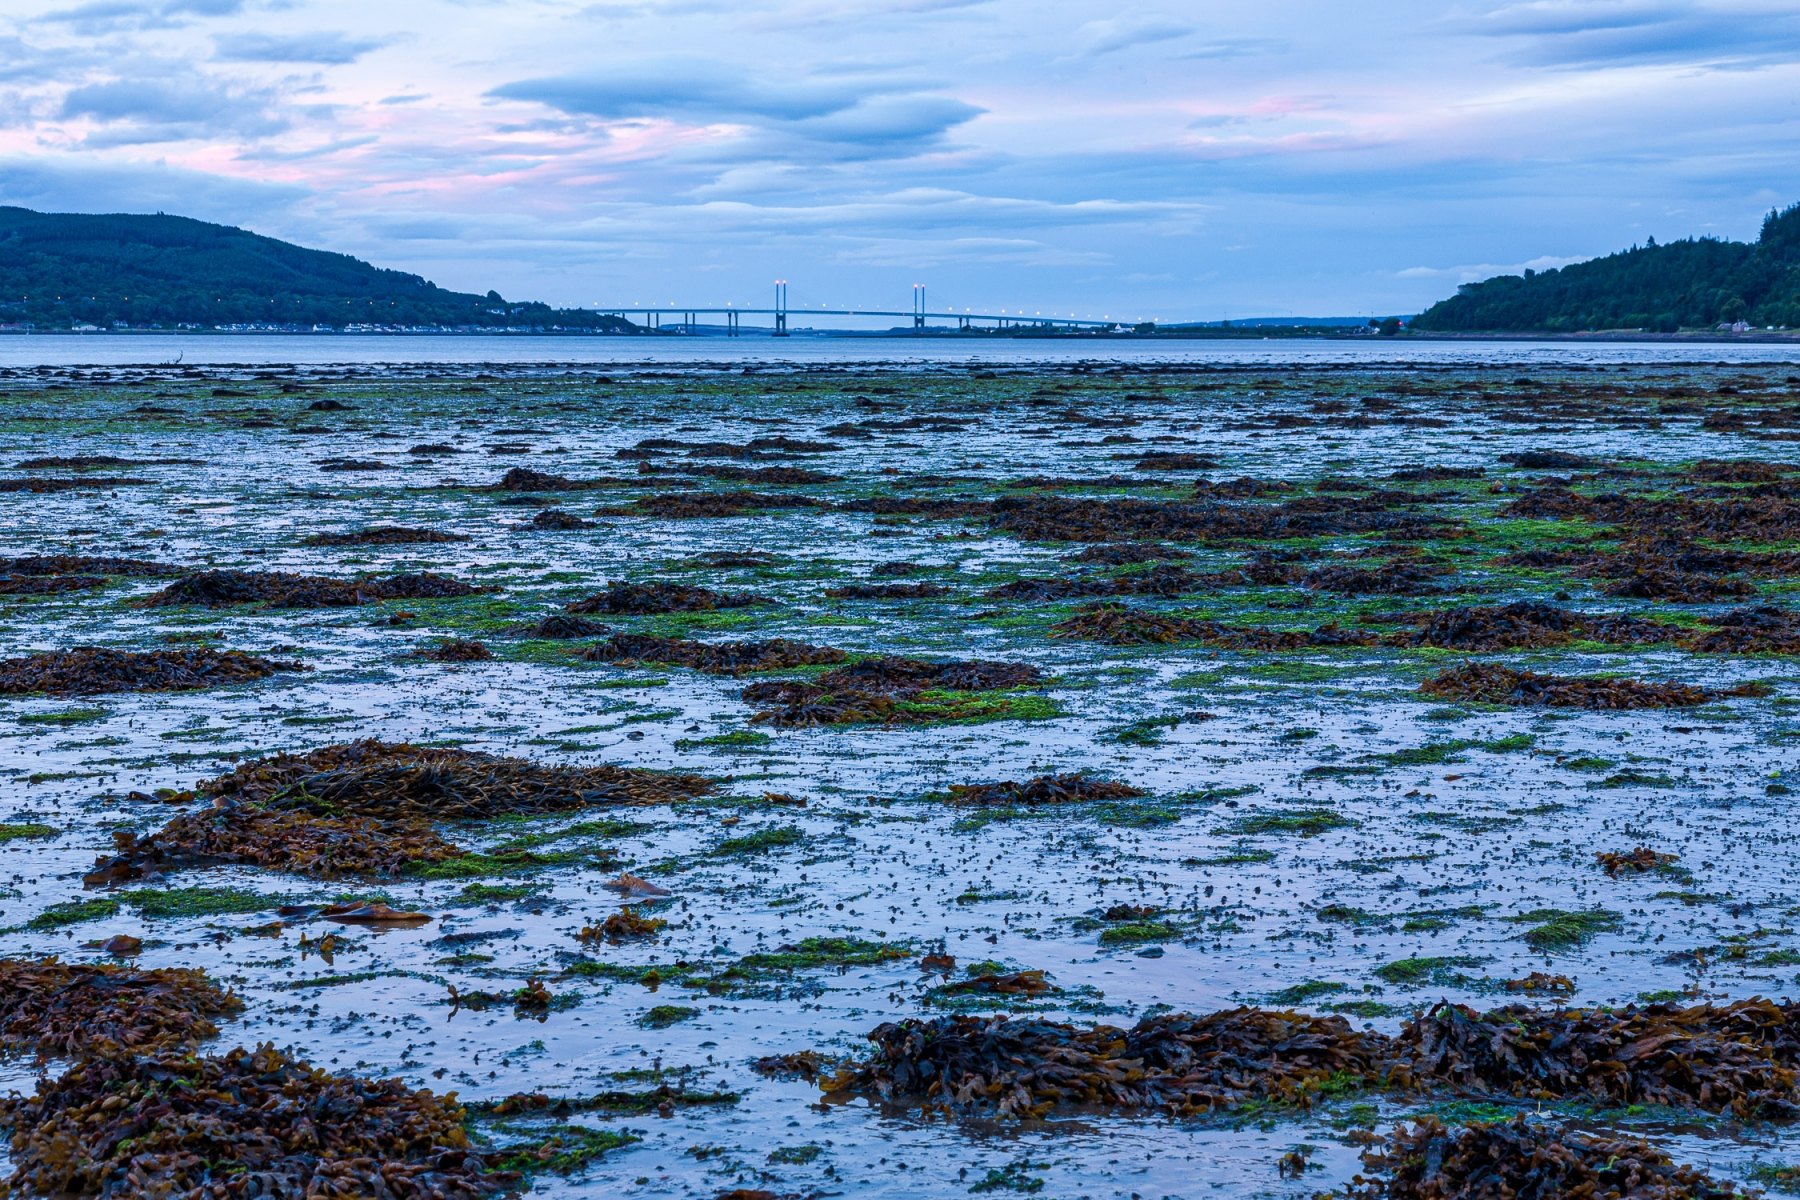 Across Beauly Firth to Kessock Bridge